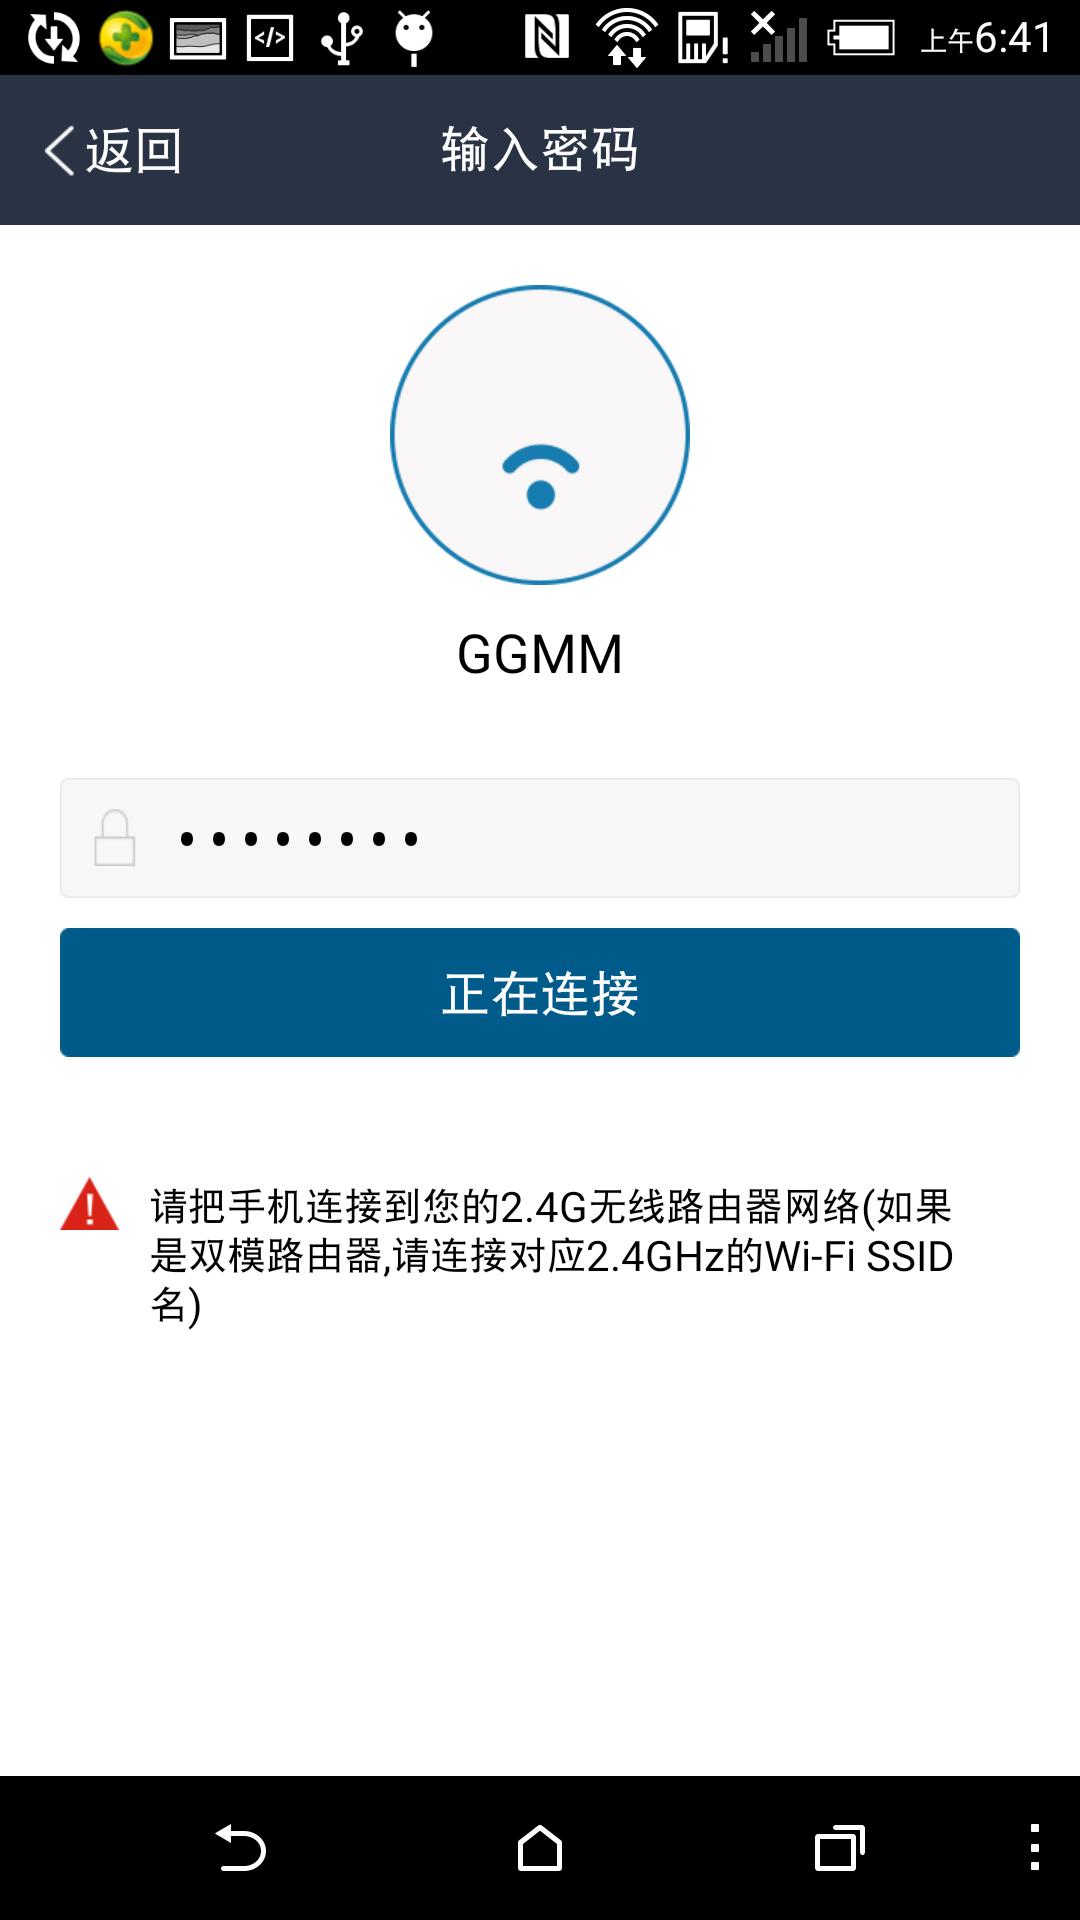 GGMM-E系列V1.8.0.161216.399 安卓版